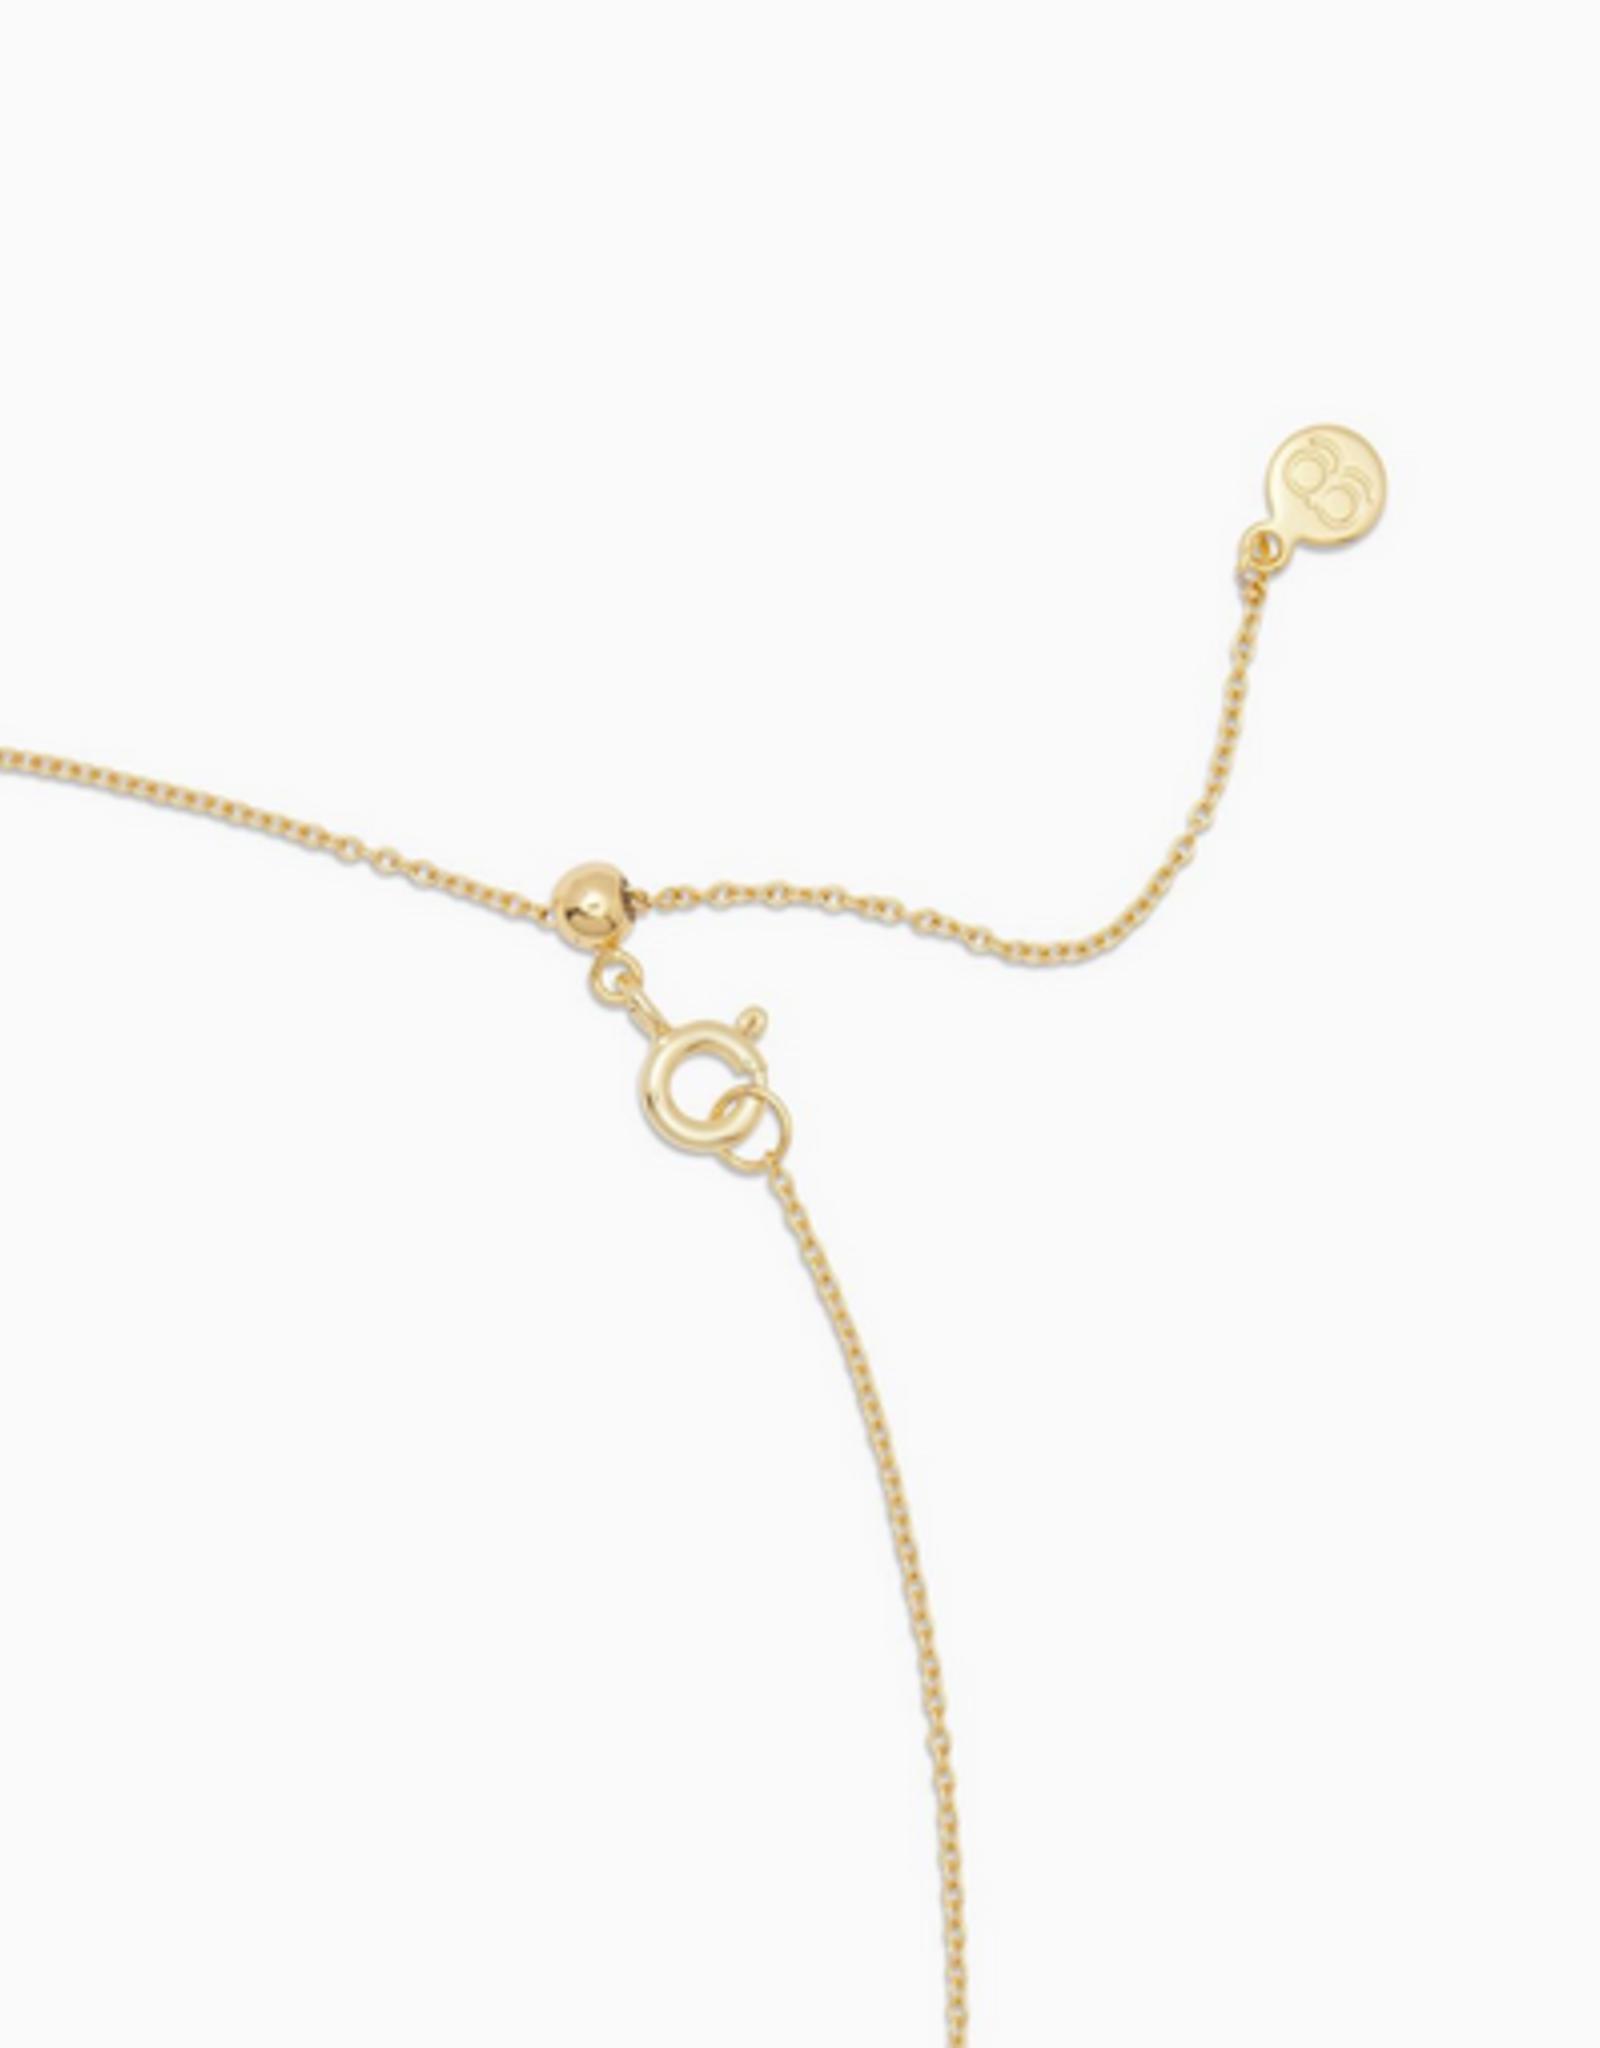 Gorjana Gorjana - Balboa Shimmer Interlocking Necklace